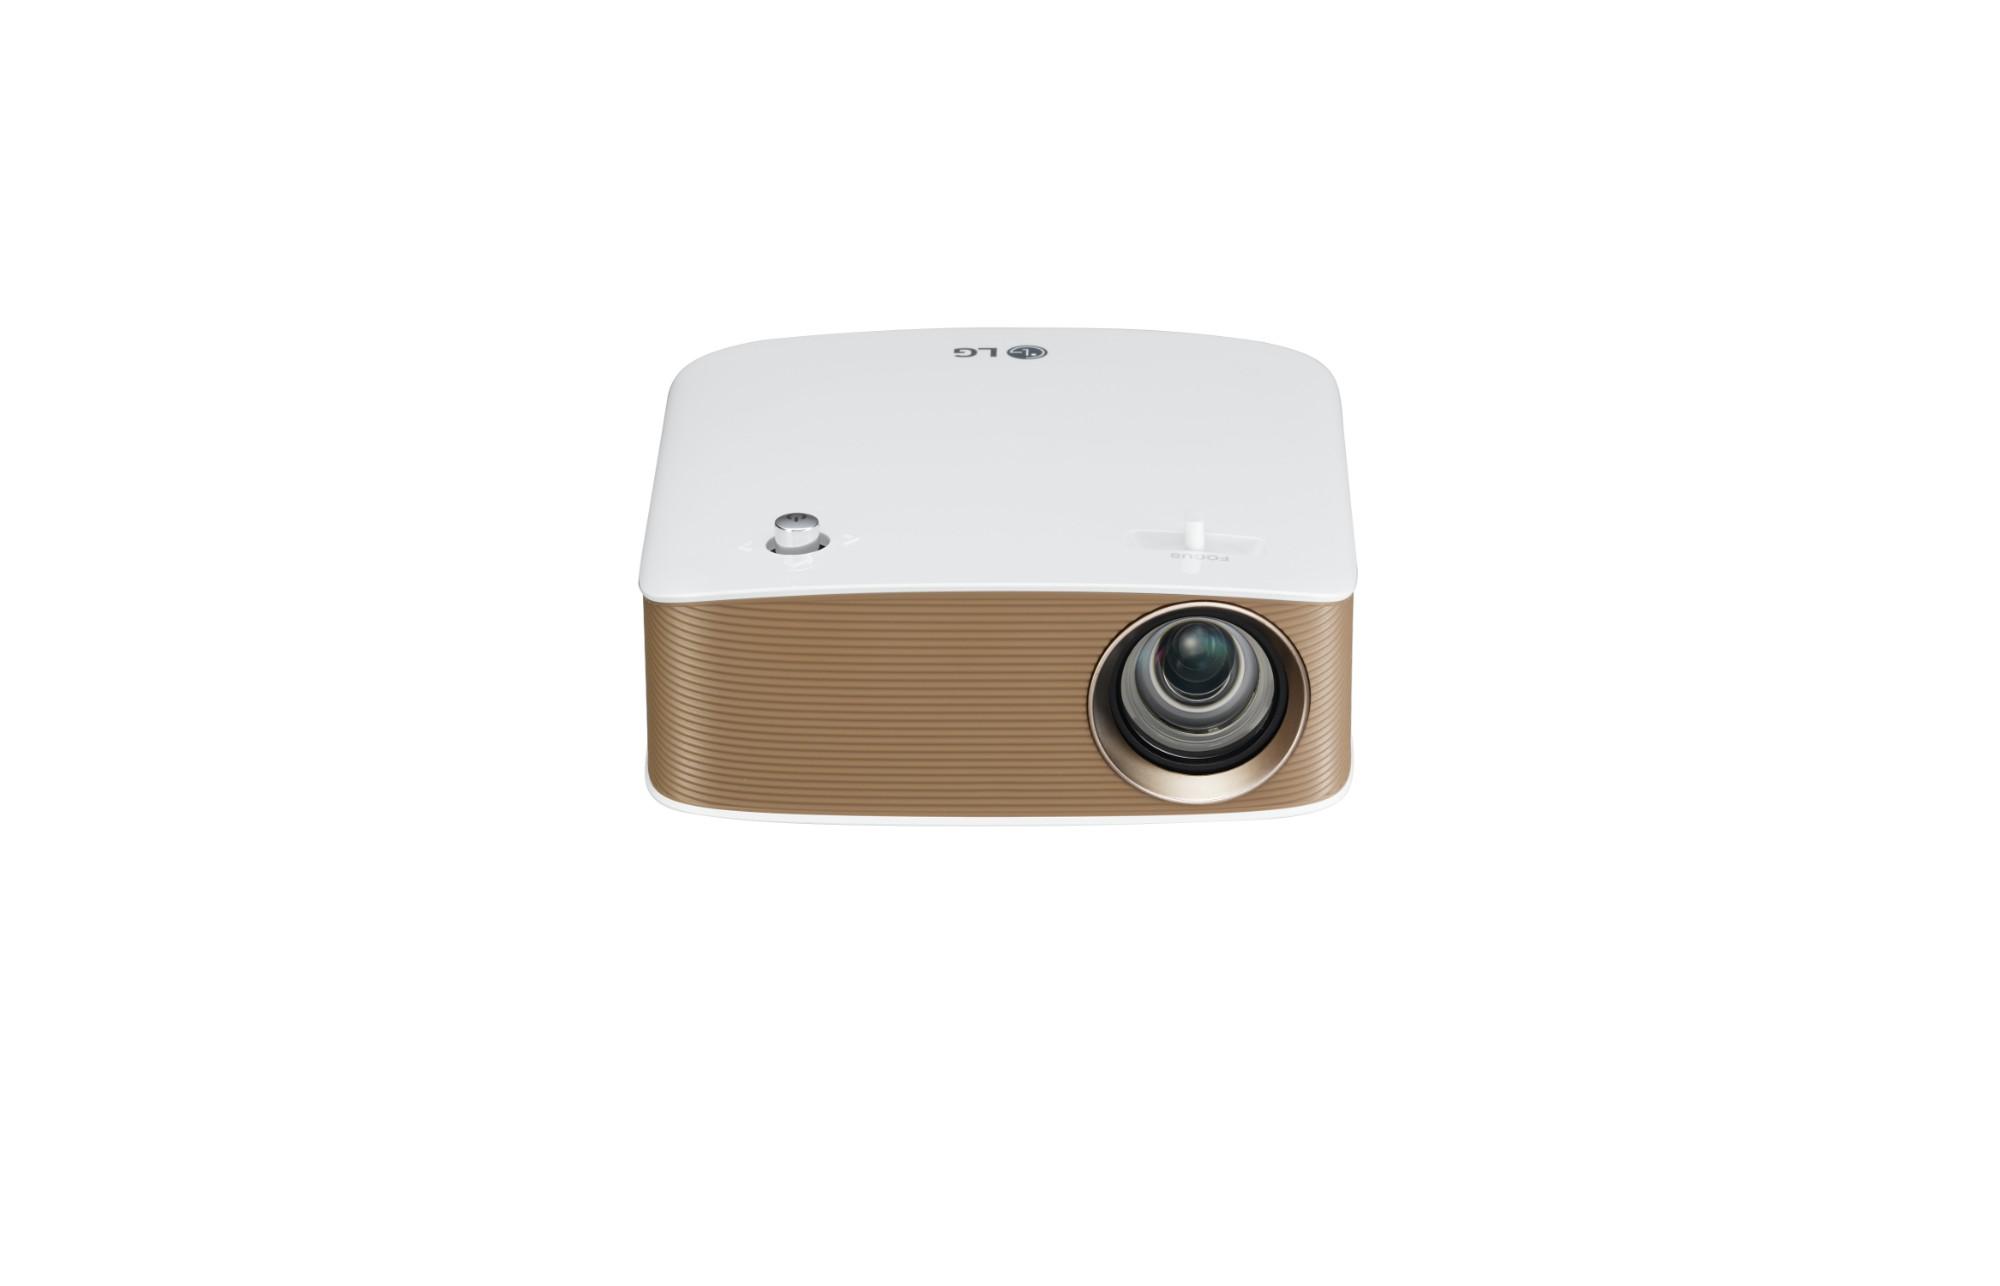 LG PH150G Projector - 130 Lumens - DLP - 720p (1280x720)